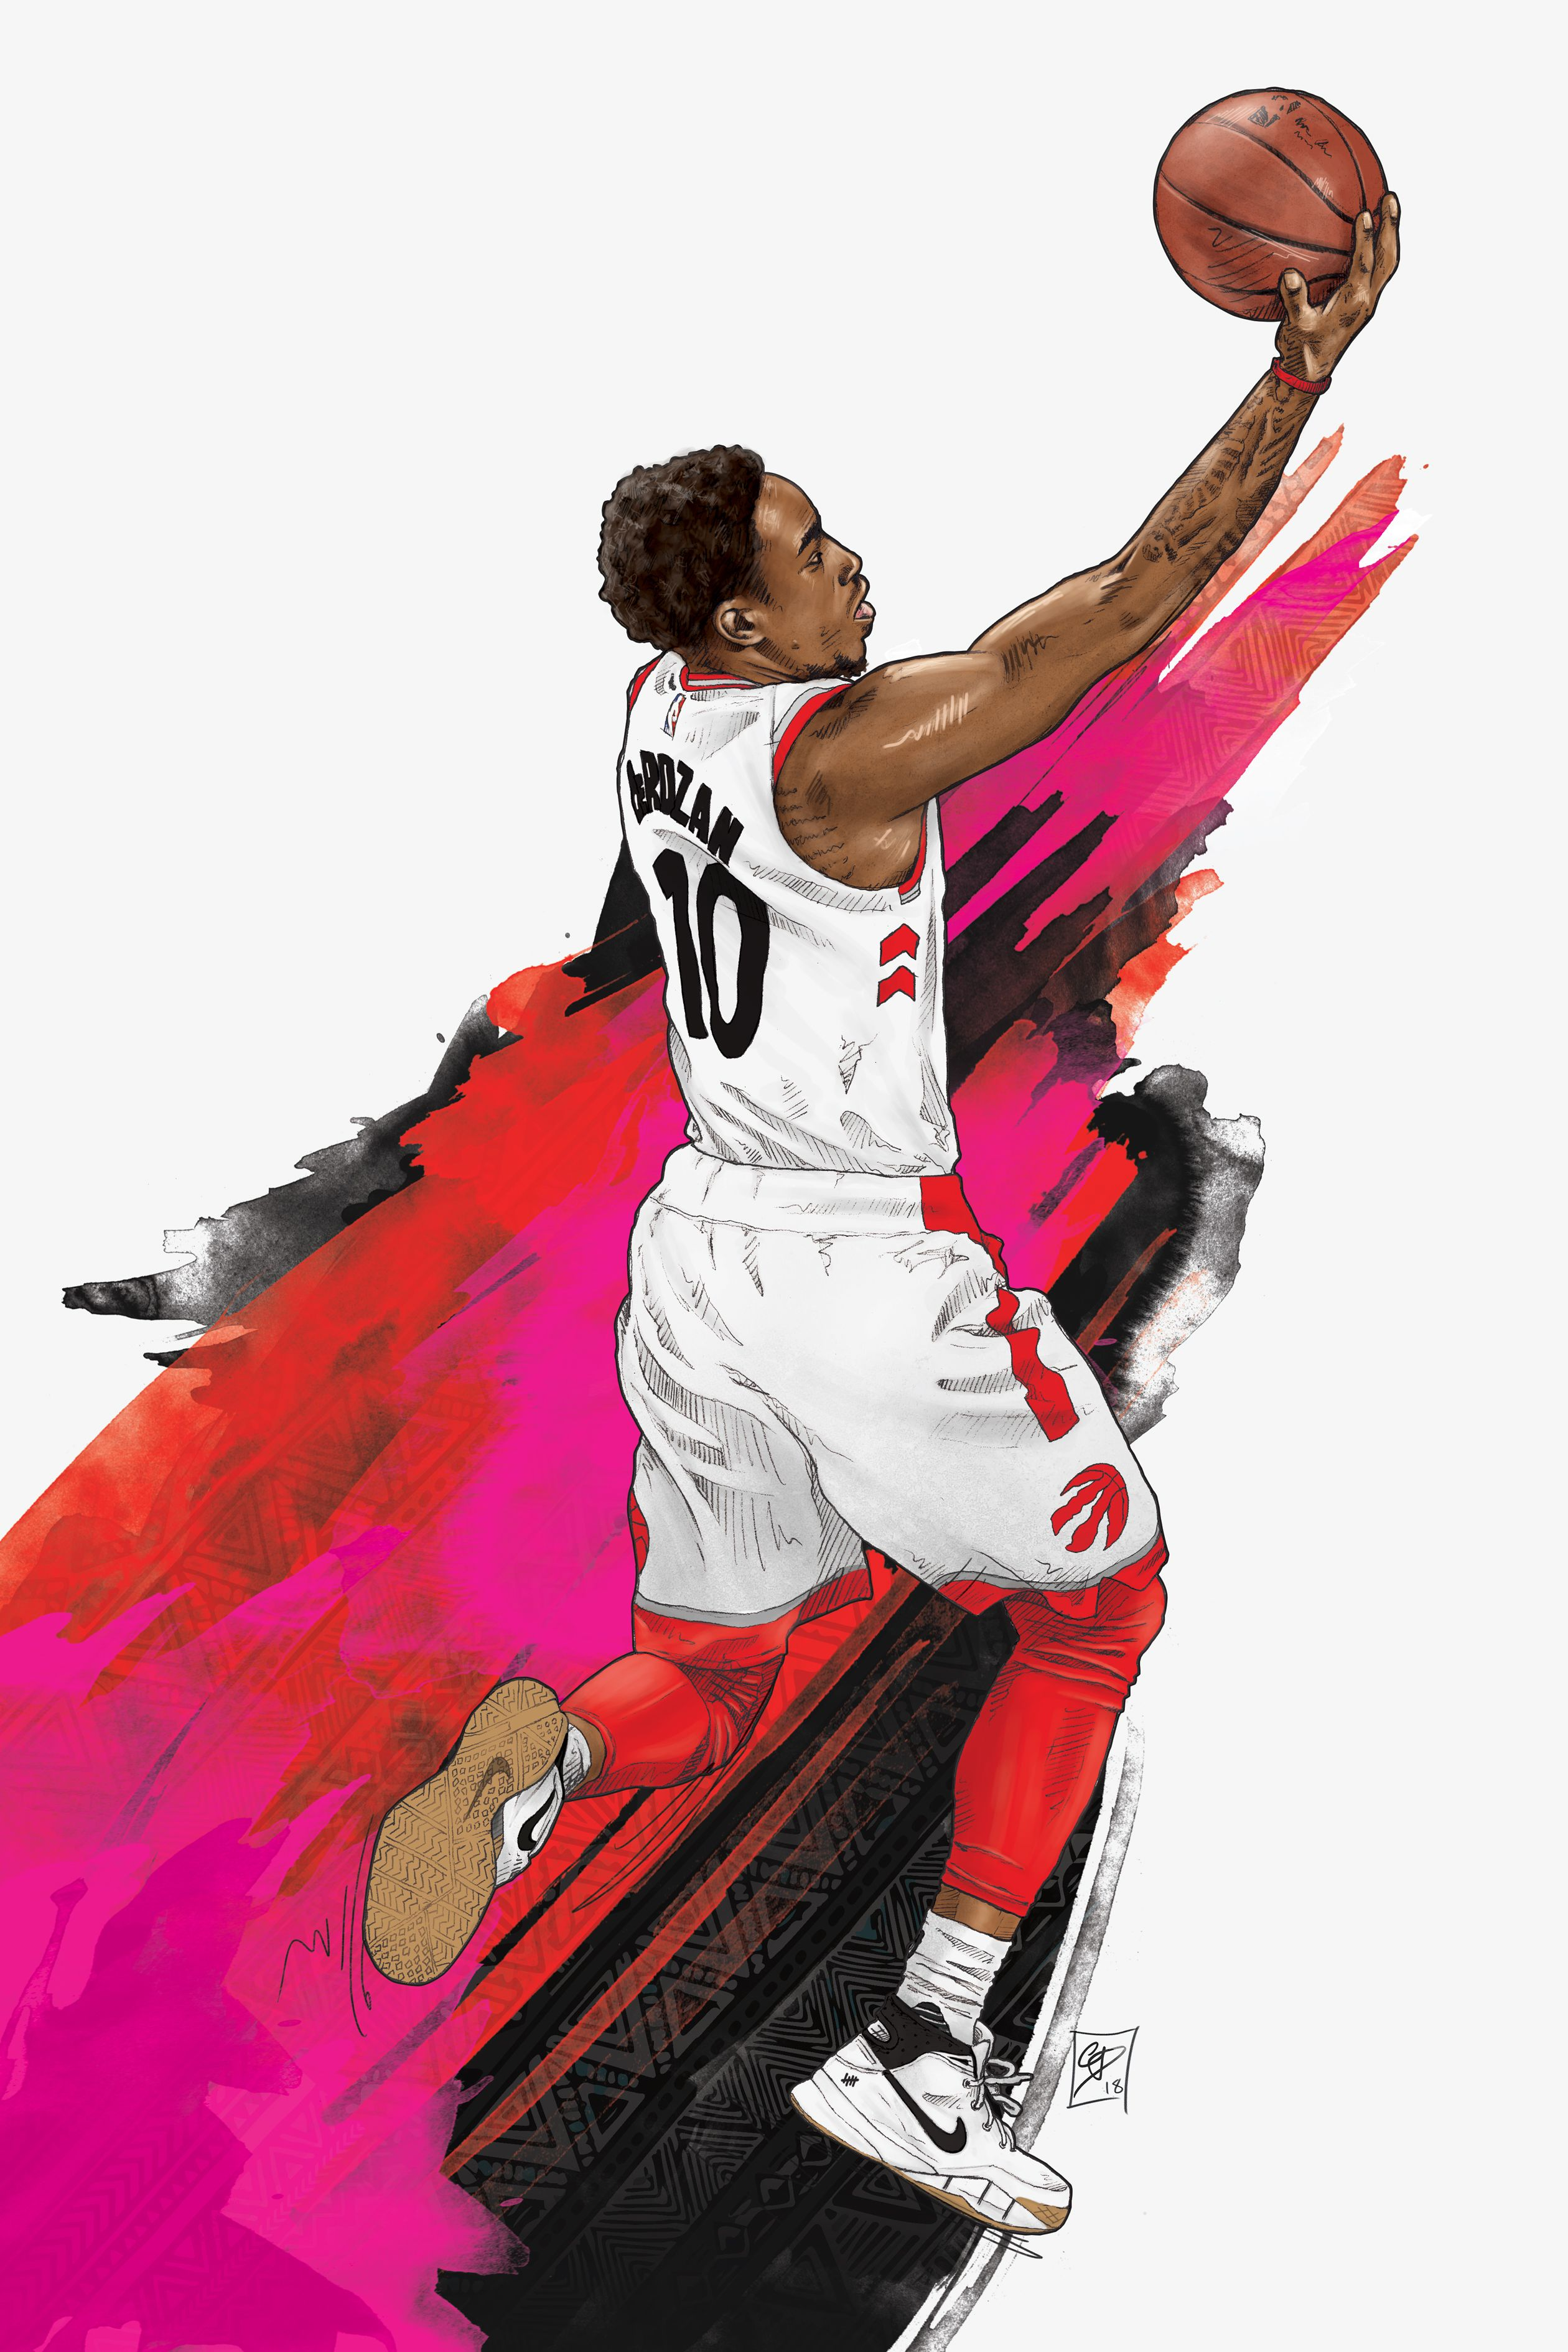 Demar Derozan Illustrated Poster Nba Wallpapers Nba Basketball Art Nba Artwork